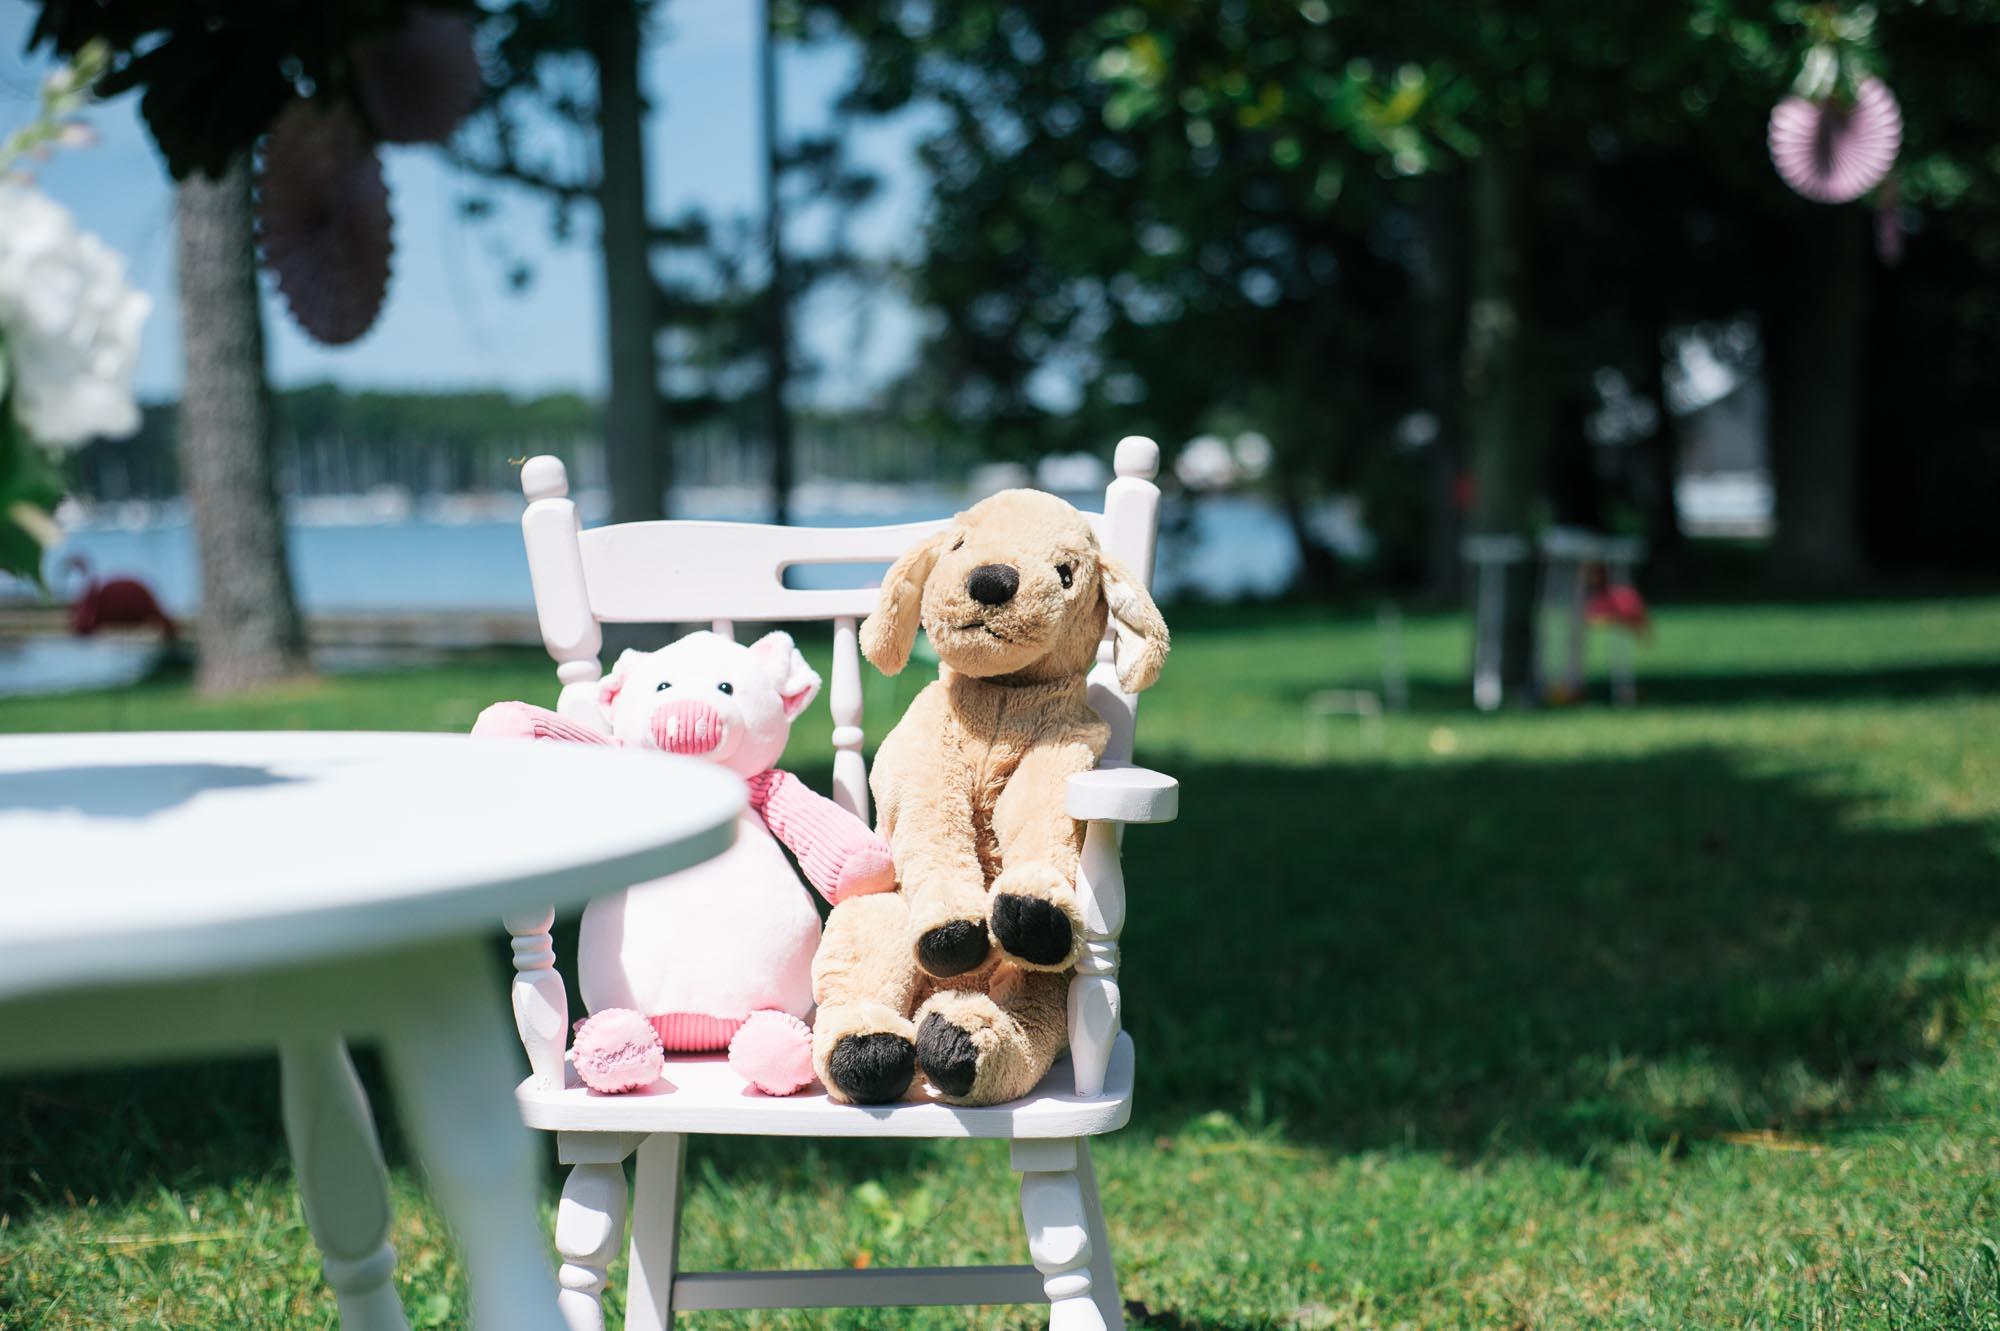 m.newsom-photography-one-year-old-girls-birthday-party-ideas-alice-in-wonderland (6 of 42).jpg